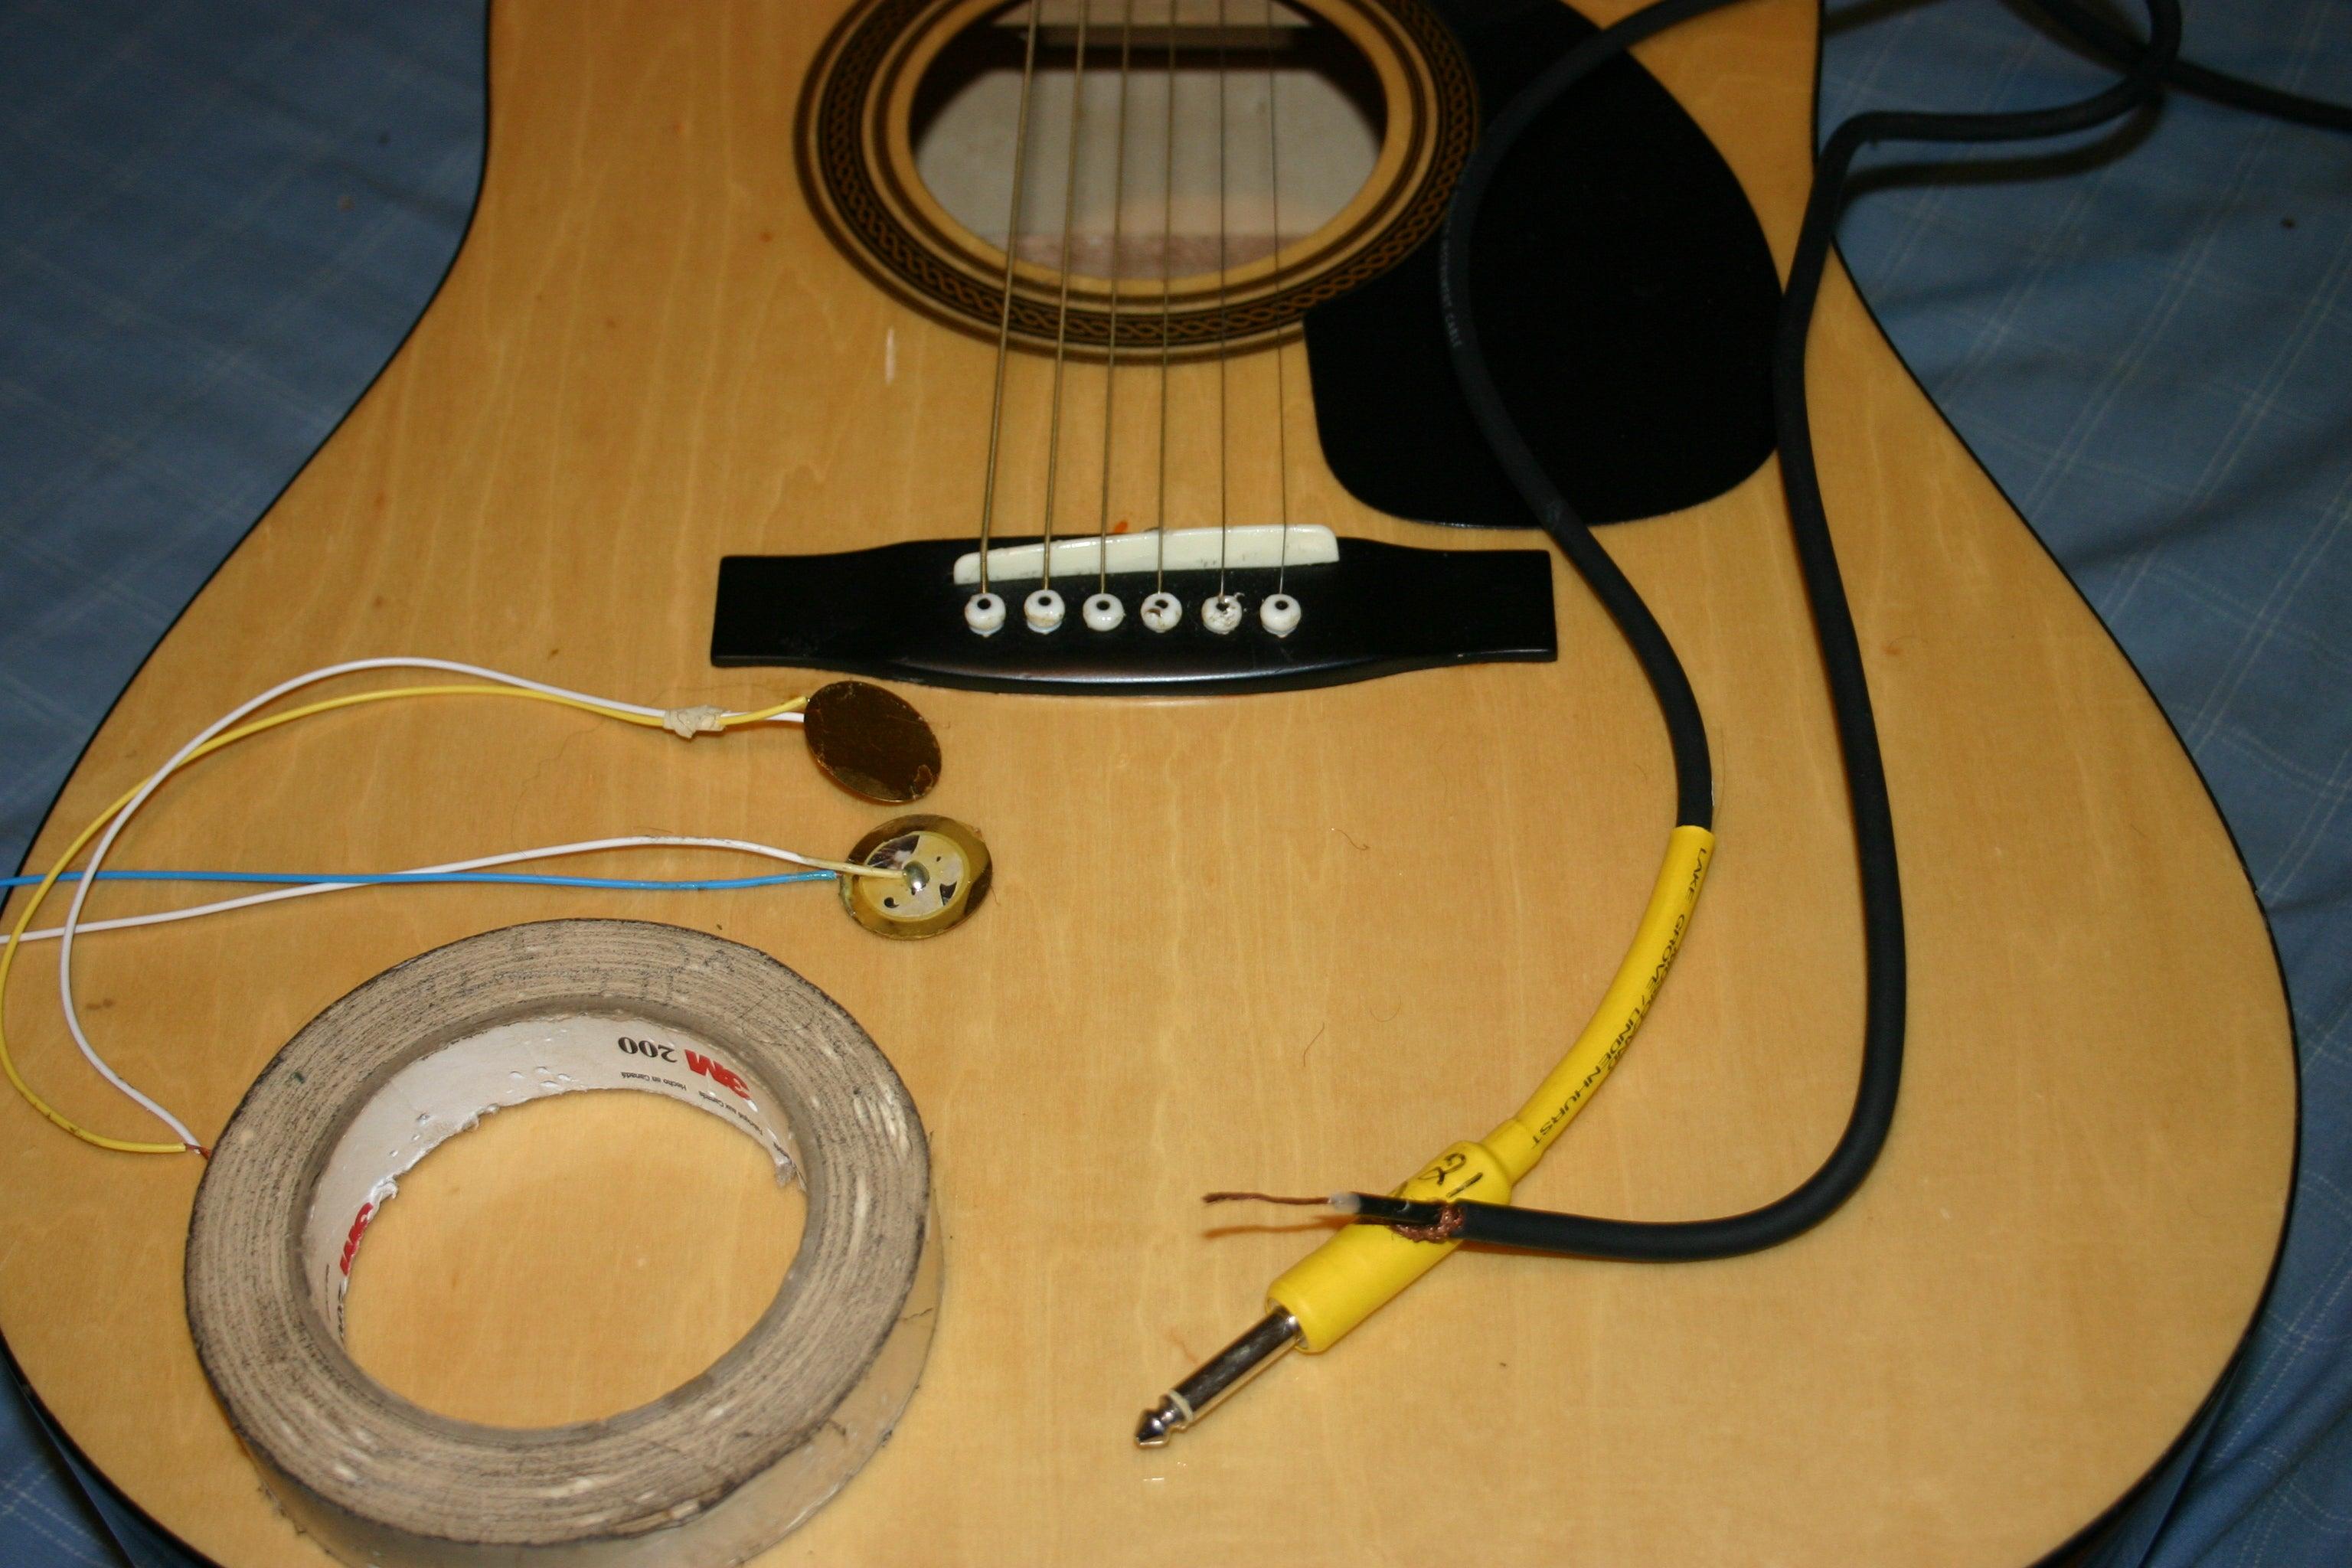 piezo guitar jack wiring diagram acoustic guitar diy piezo pickups 6 steps instructables  acoustic guitar diy piezo pickups 6